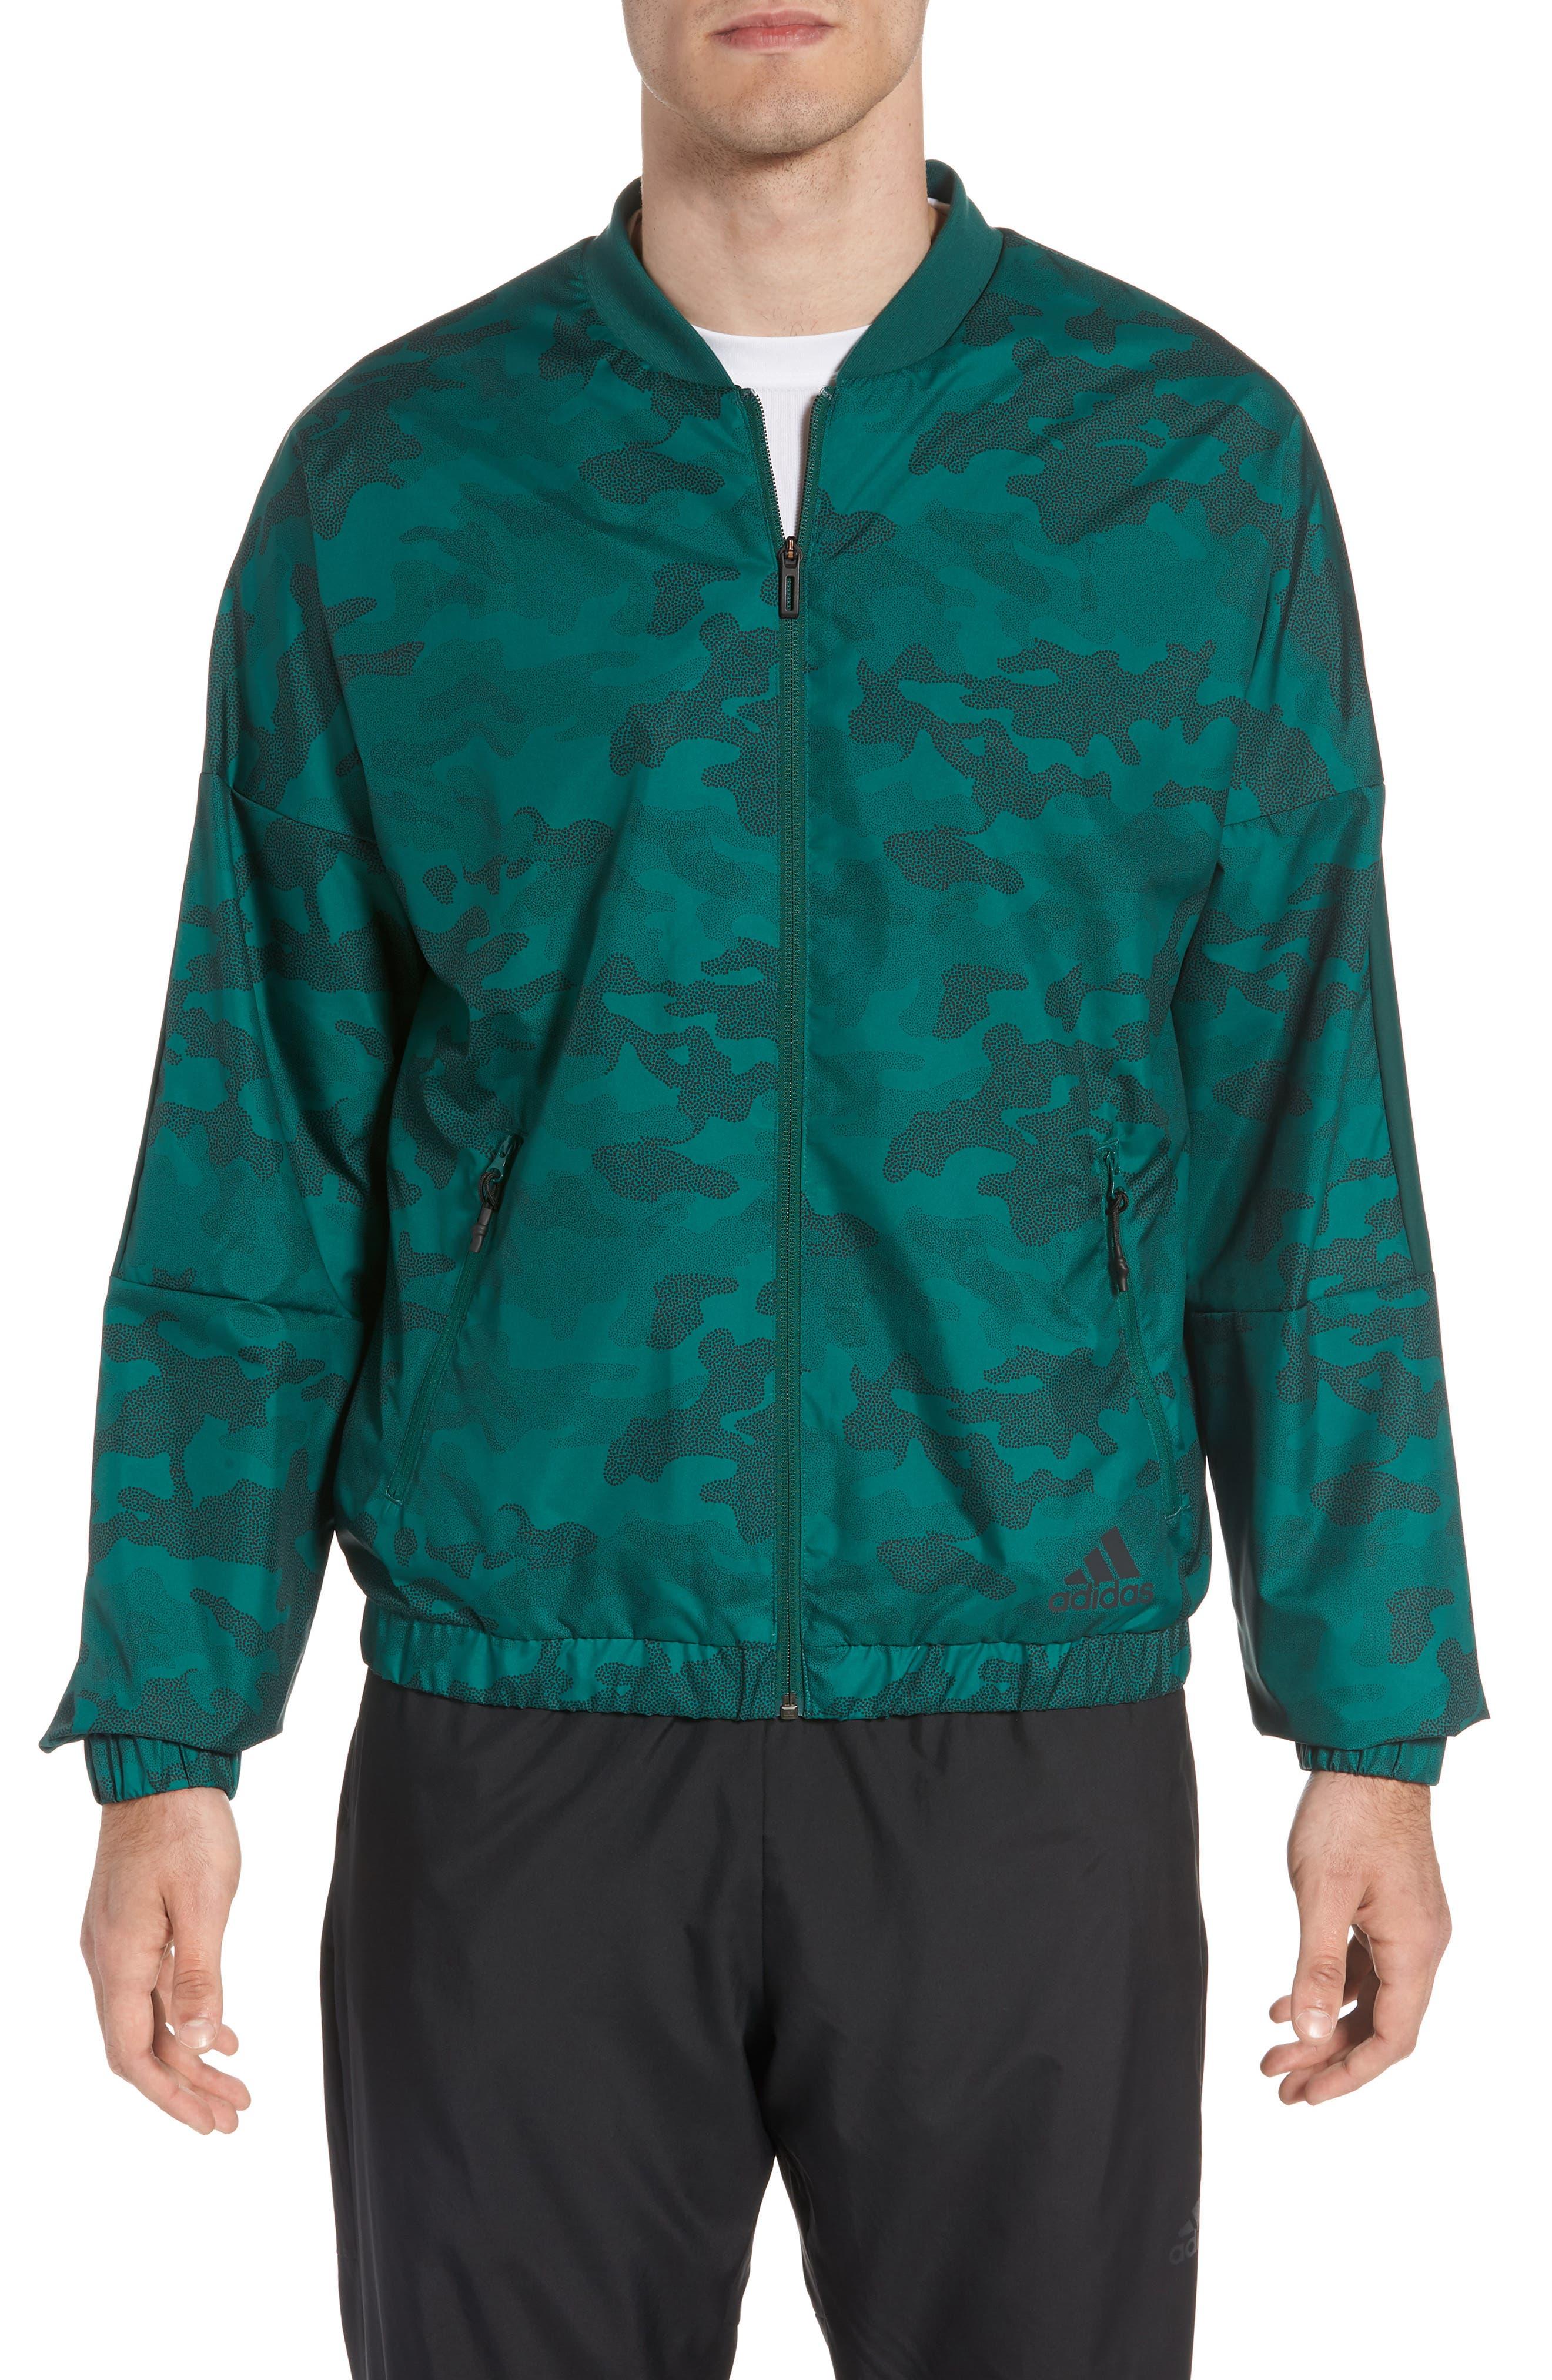 Regular Fit Track Jacket,                             Main thumbnail 1, color,                             305